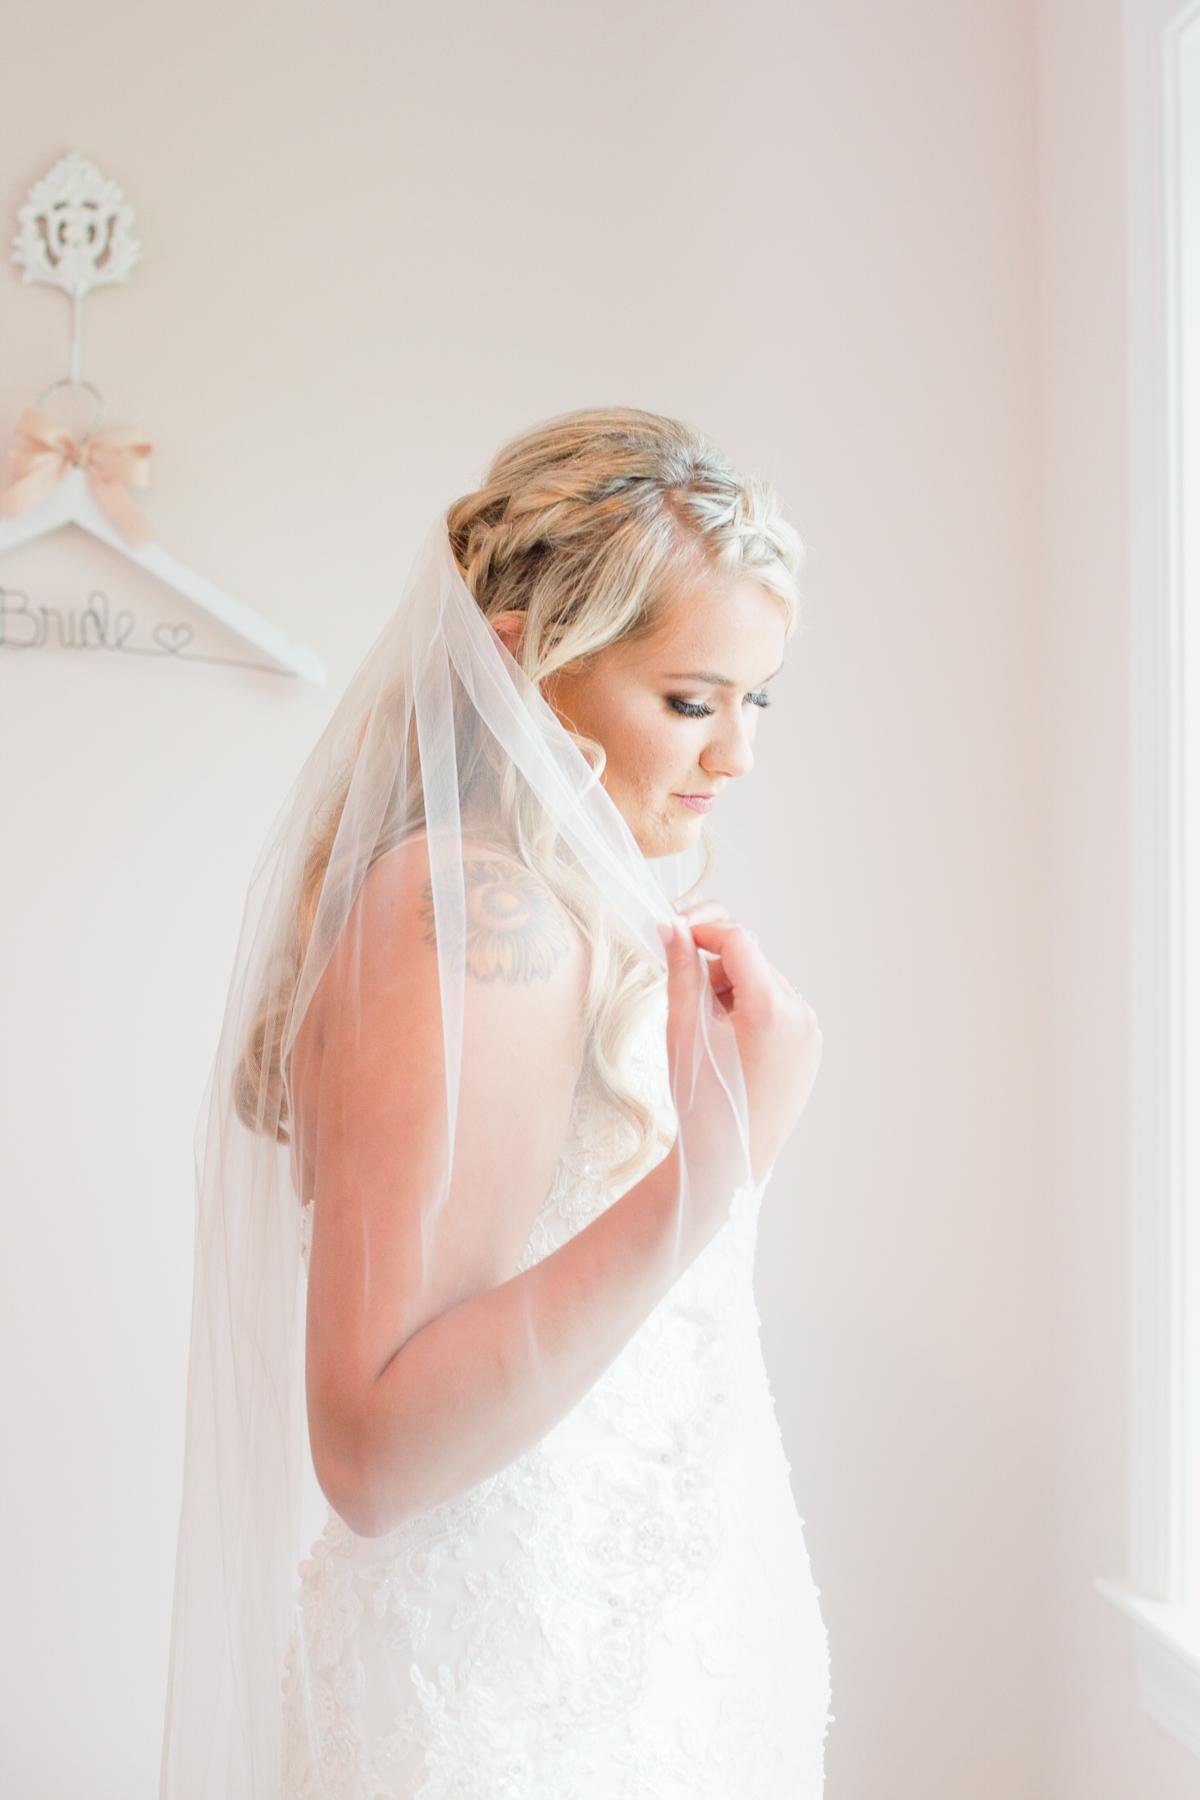 The-venue-at-white-oak-farms-wedding-nashville-wedding-photographers-0101.jpg